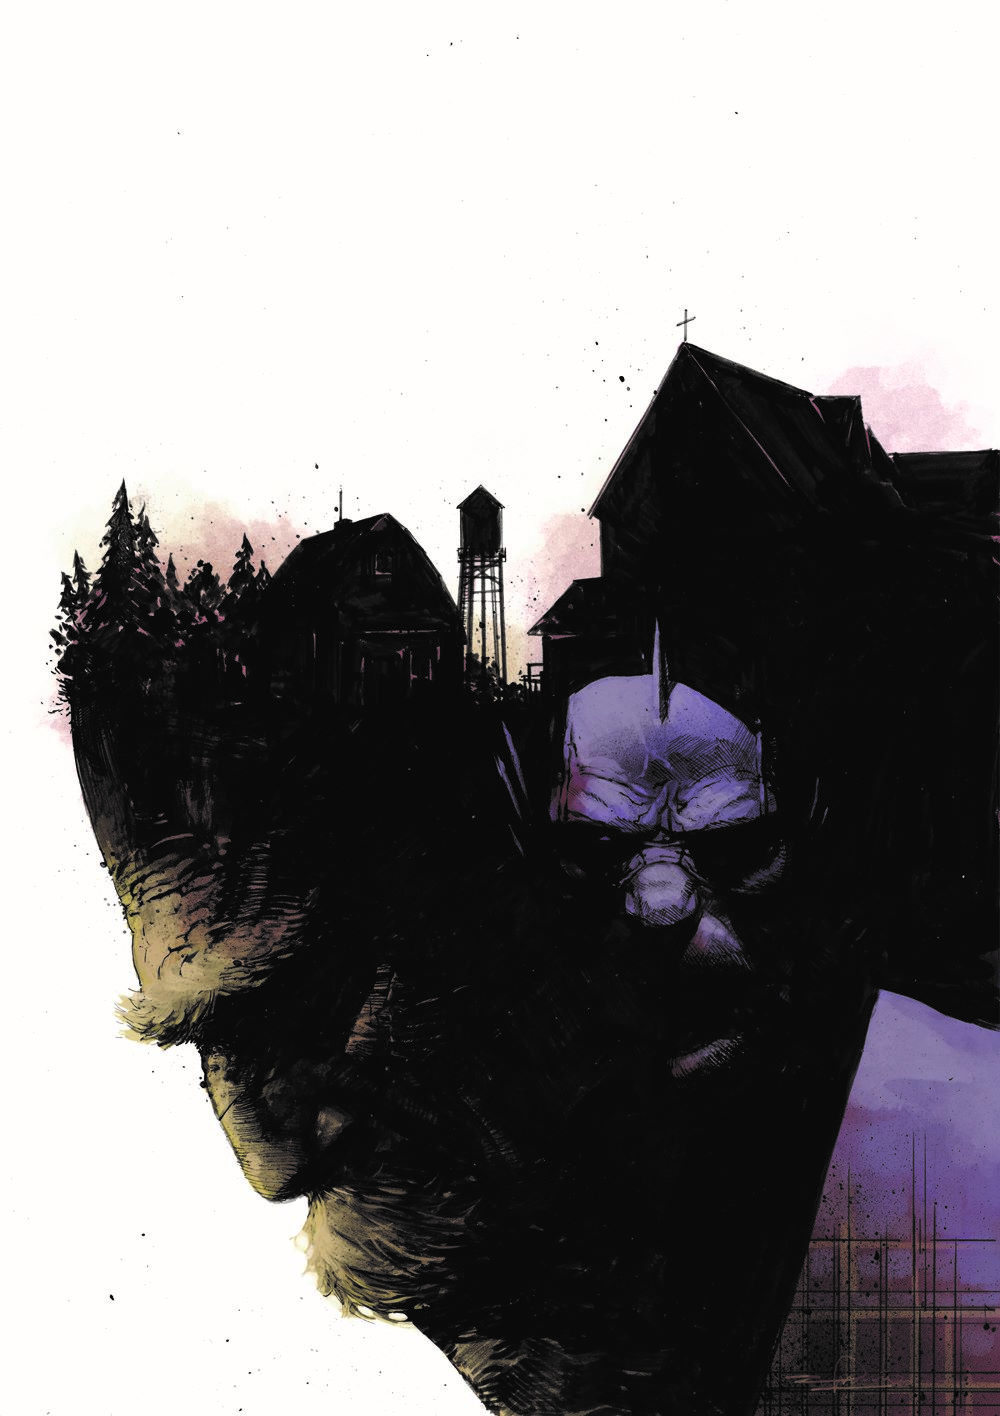 BKHMRVIS_i3_VAR_C_ZAFFINO_FC_FNL Dark Horse Comics April 2021 Solicitations